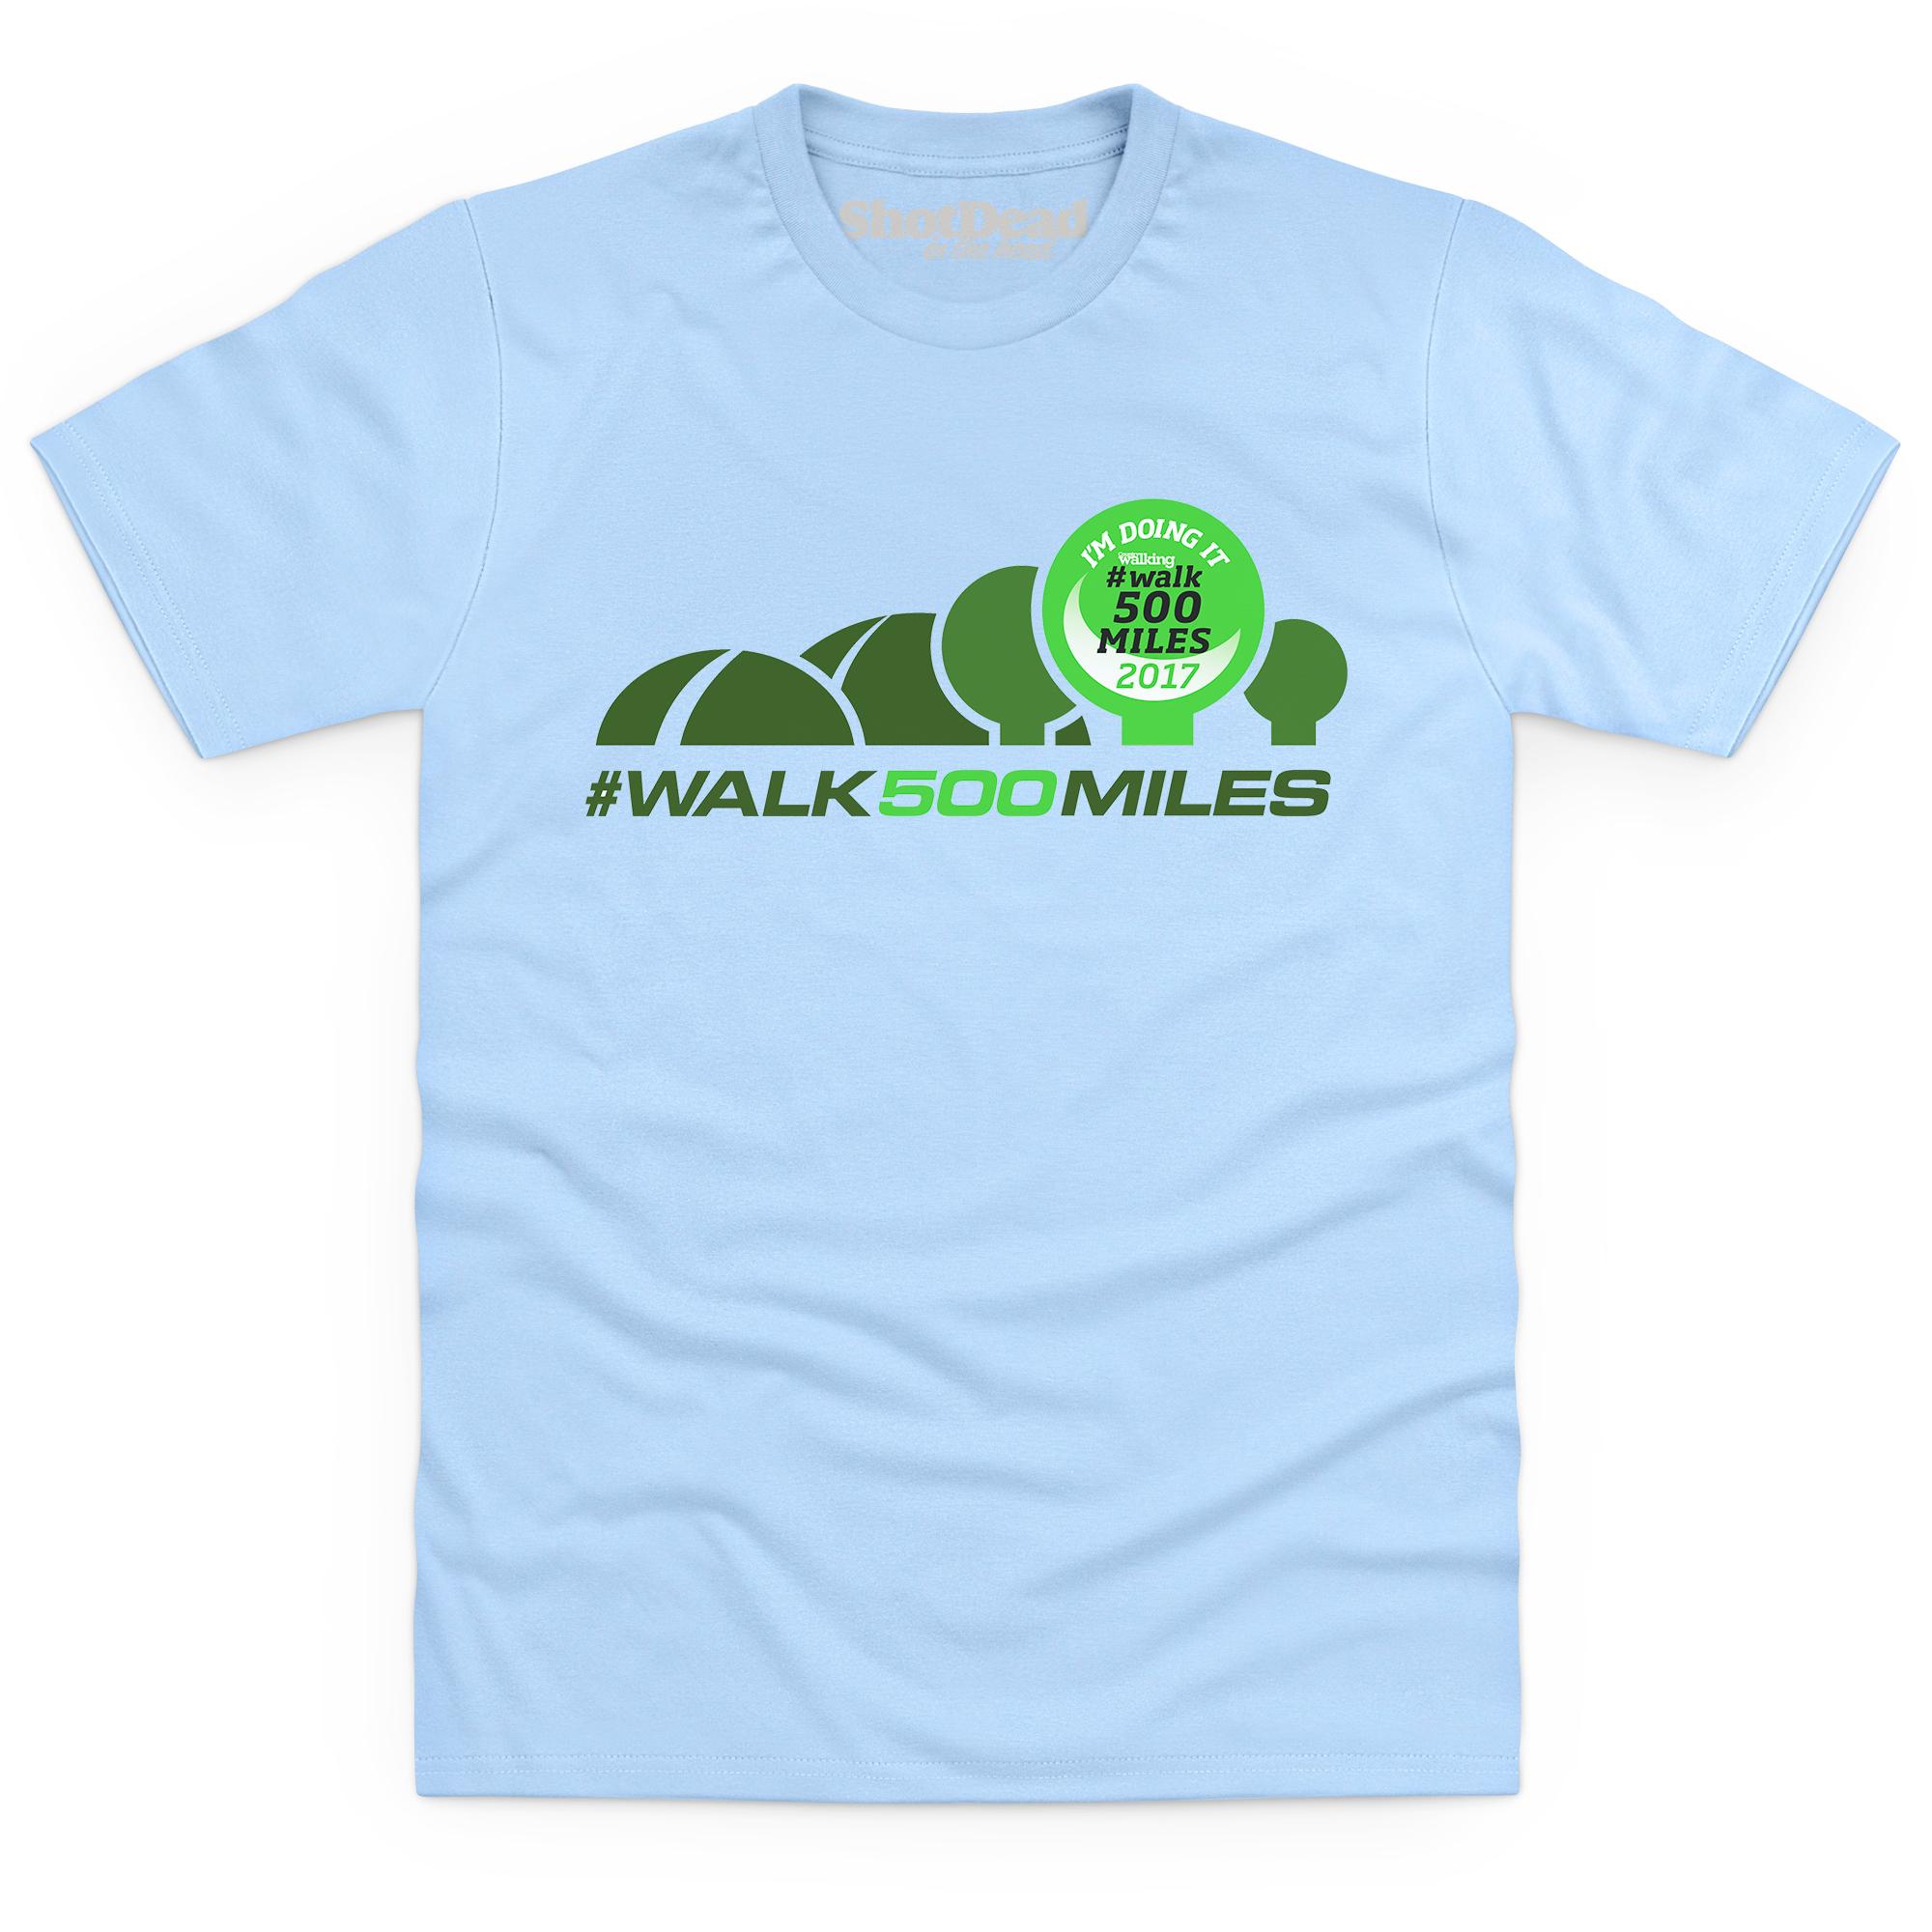 500-mile t-shirts